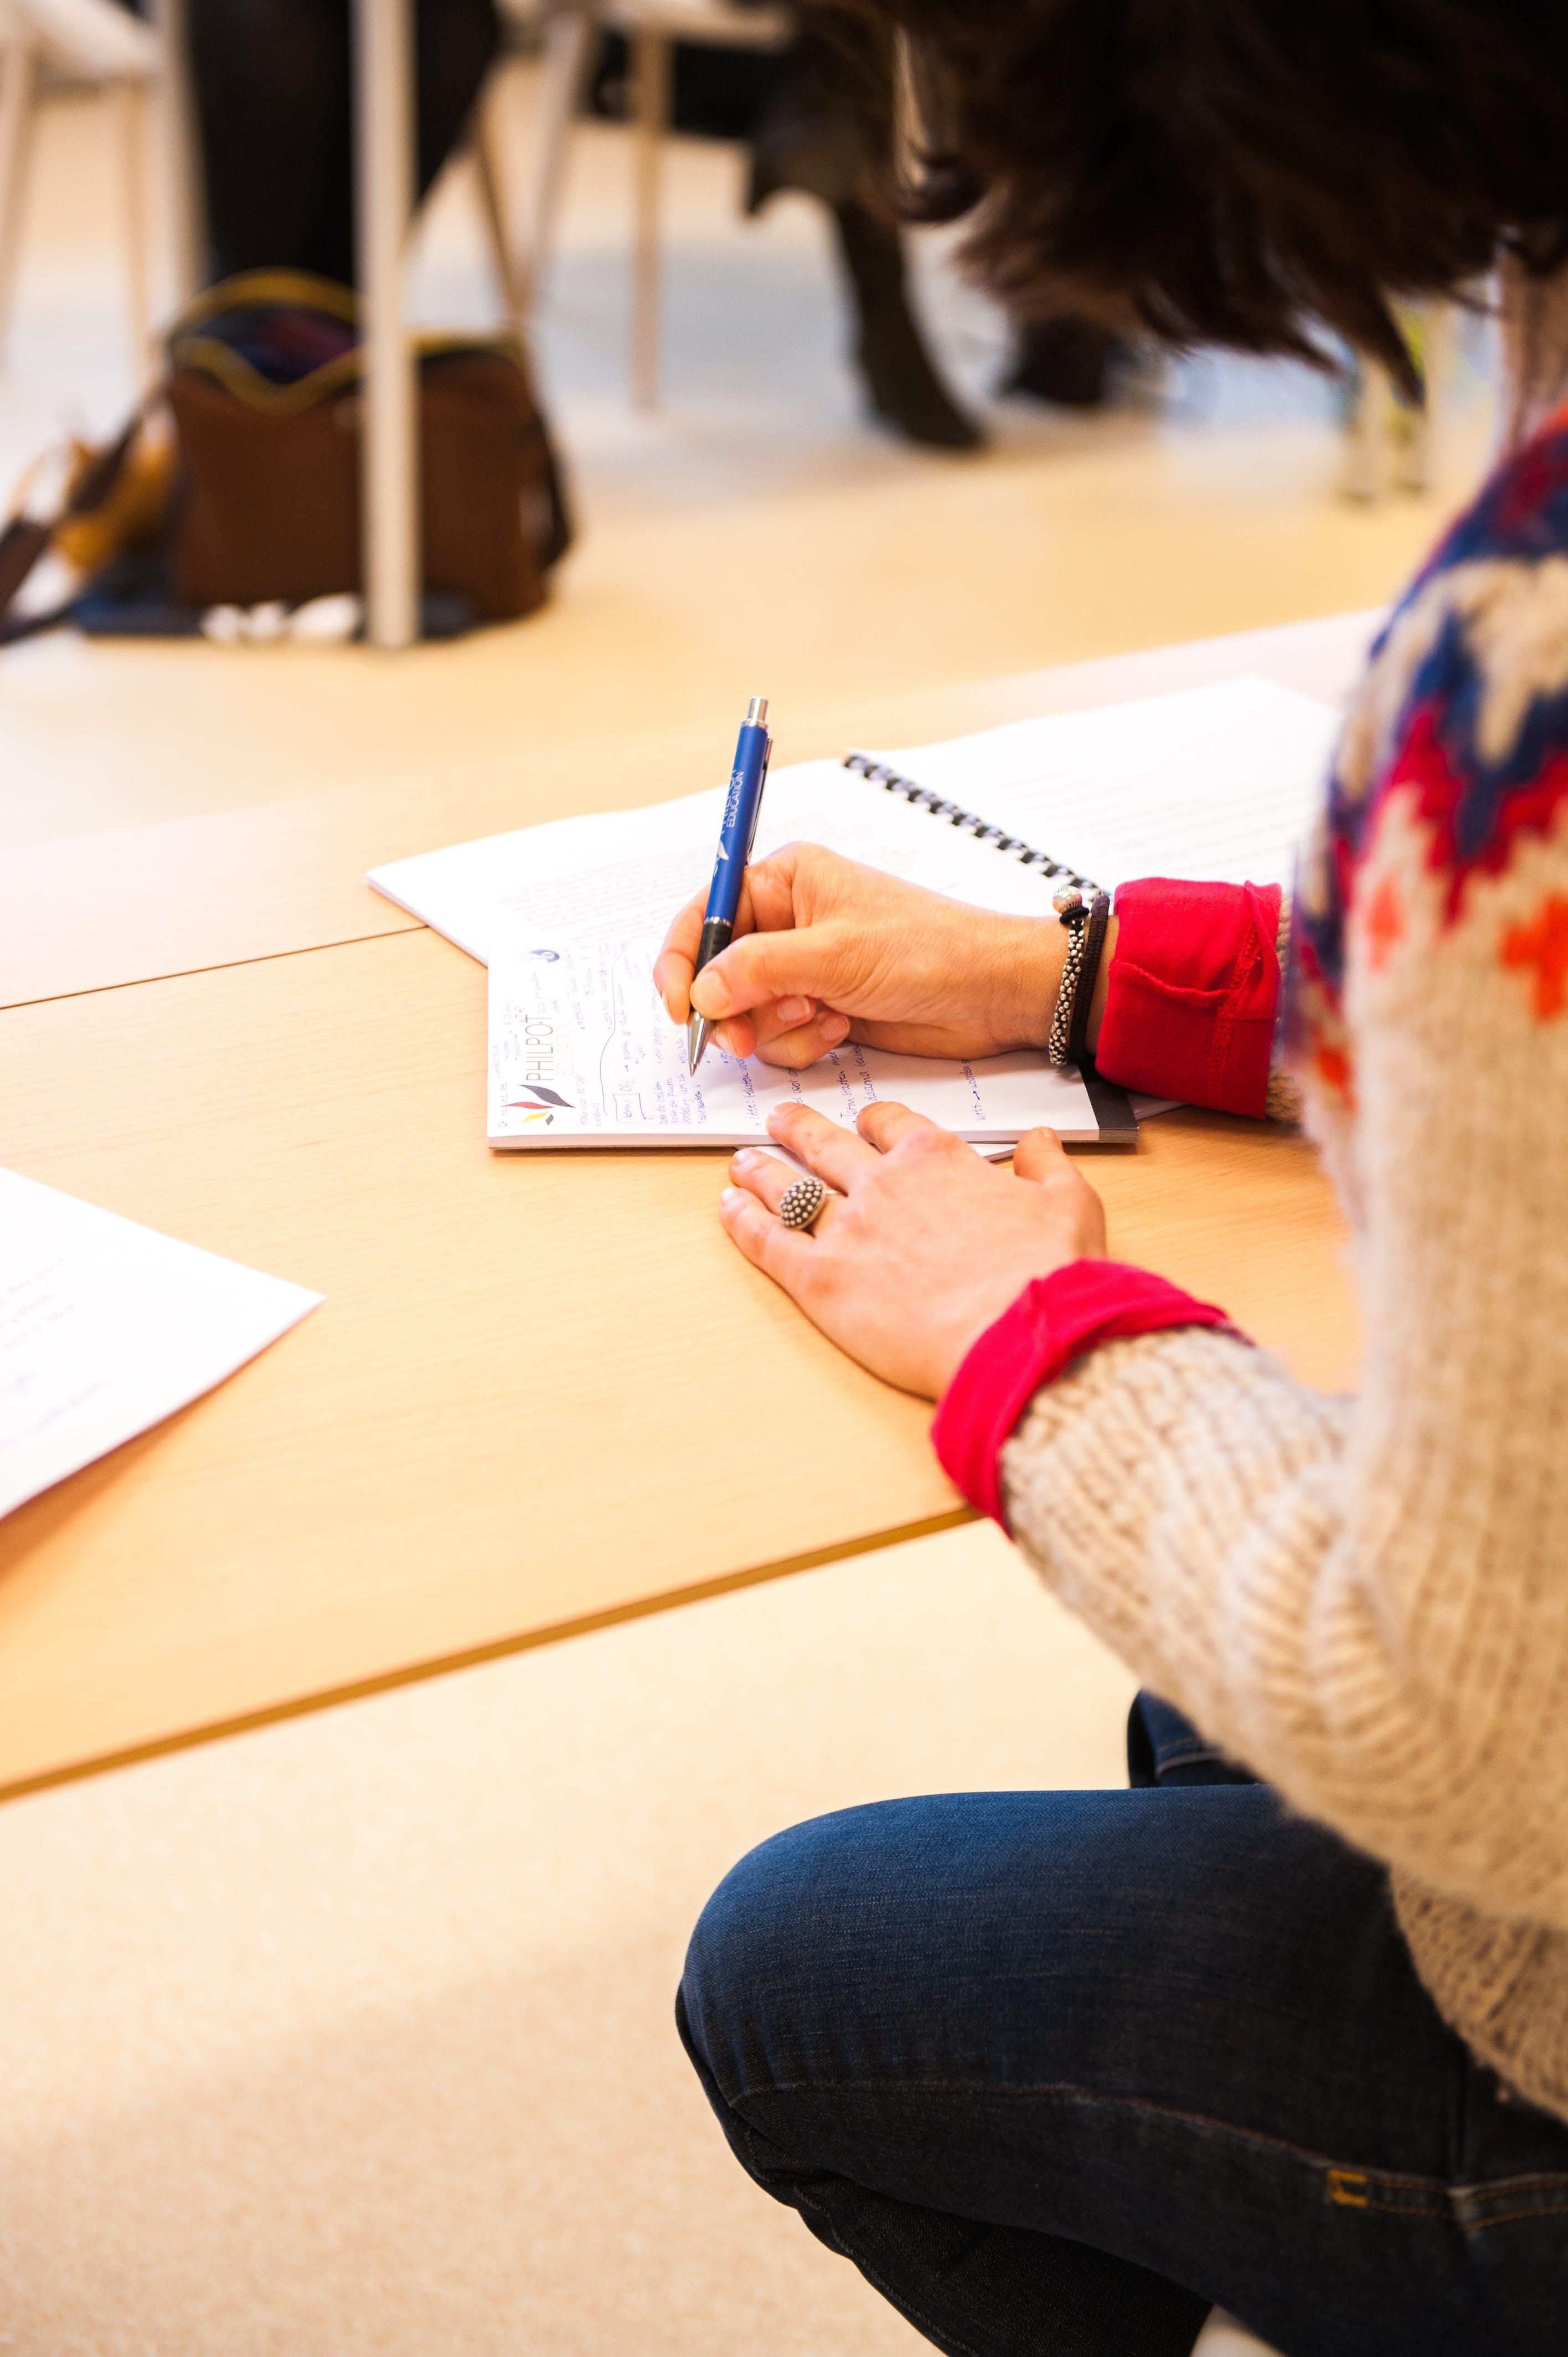 Gratis arkivbilde med barn, blyant, elev, høyskole